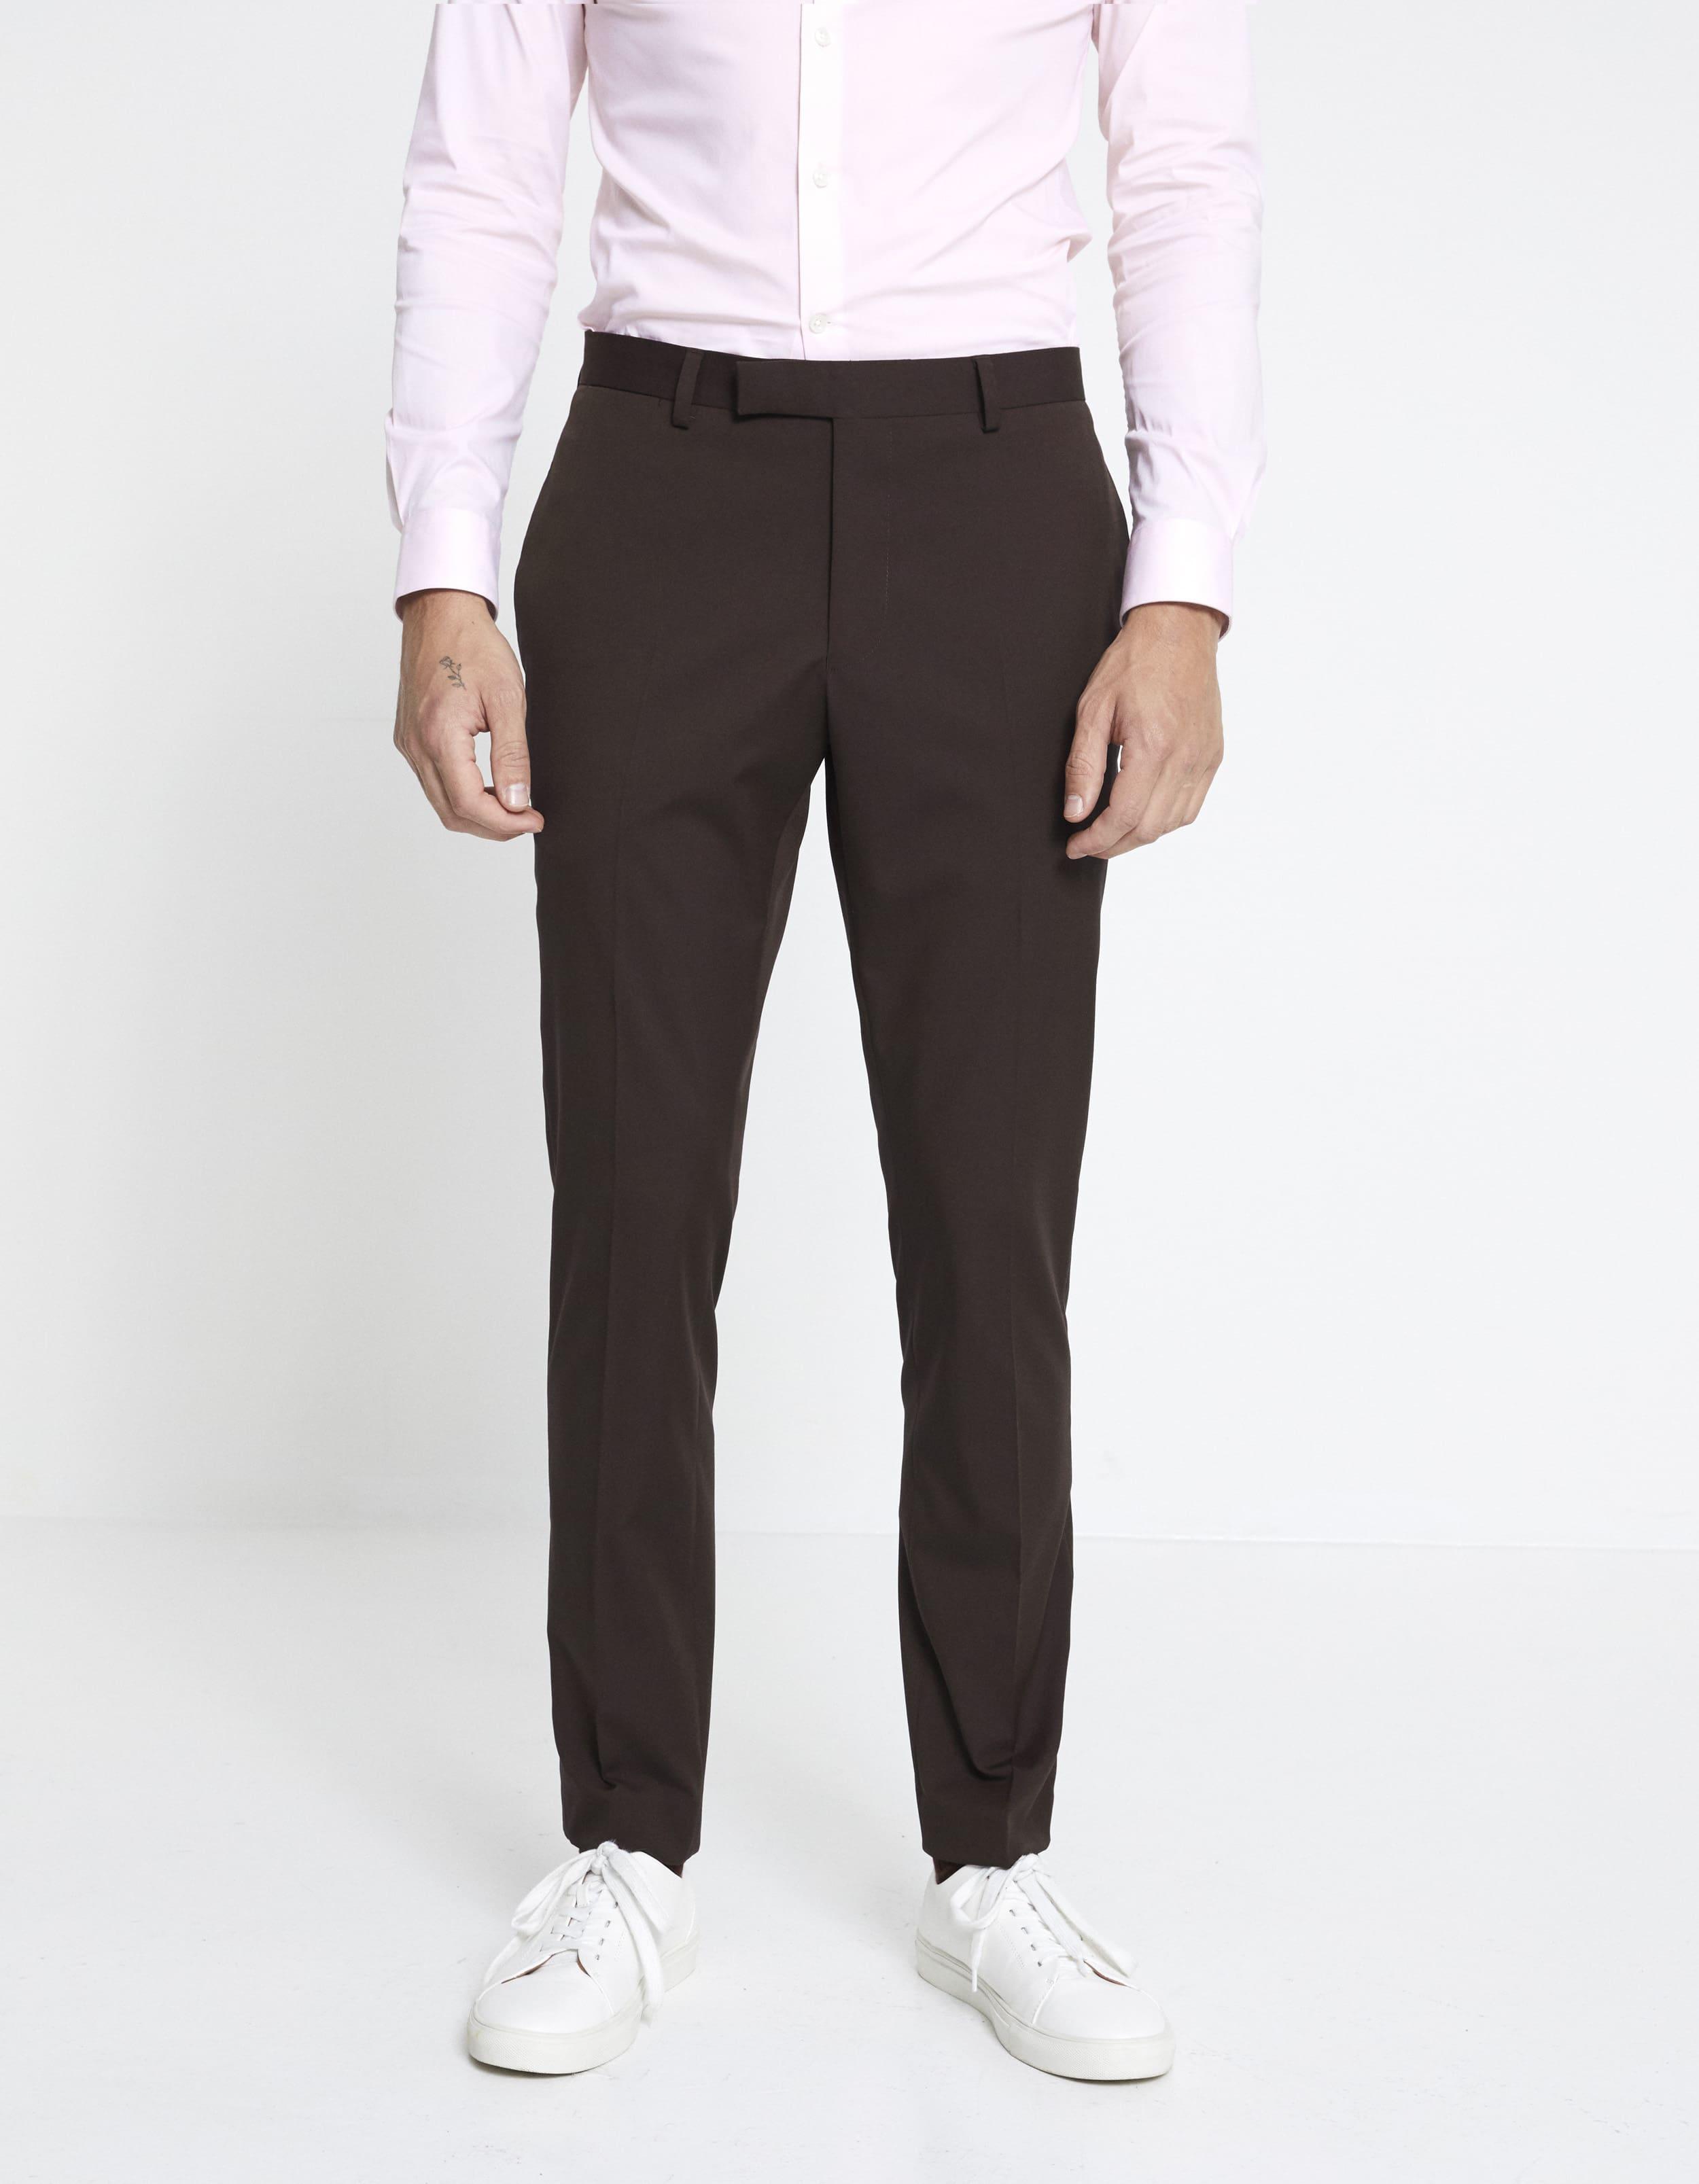 Pantalon Skinny extra slim – bordeaux Celio Club Prix 59,99 €